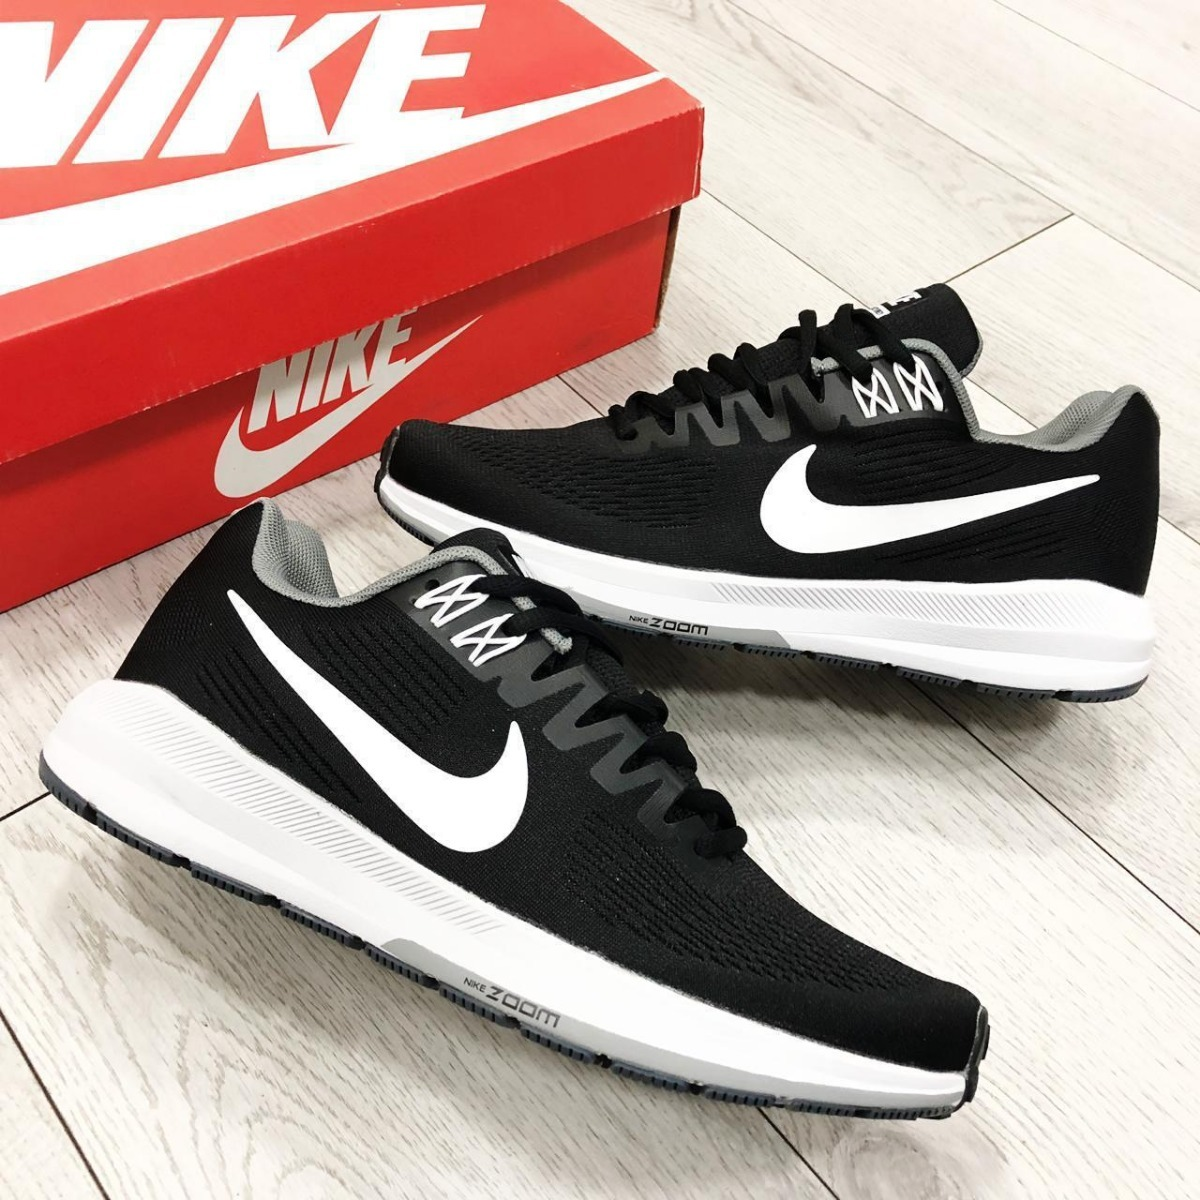 0ffb43288e Zapatillas Tenis Nike Air Zoom Structure 22 Hombre Original ...